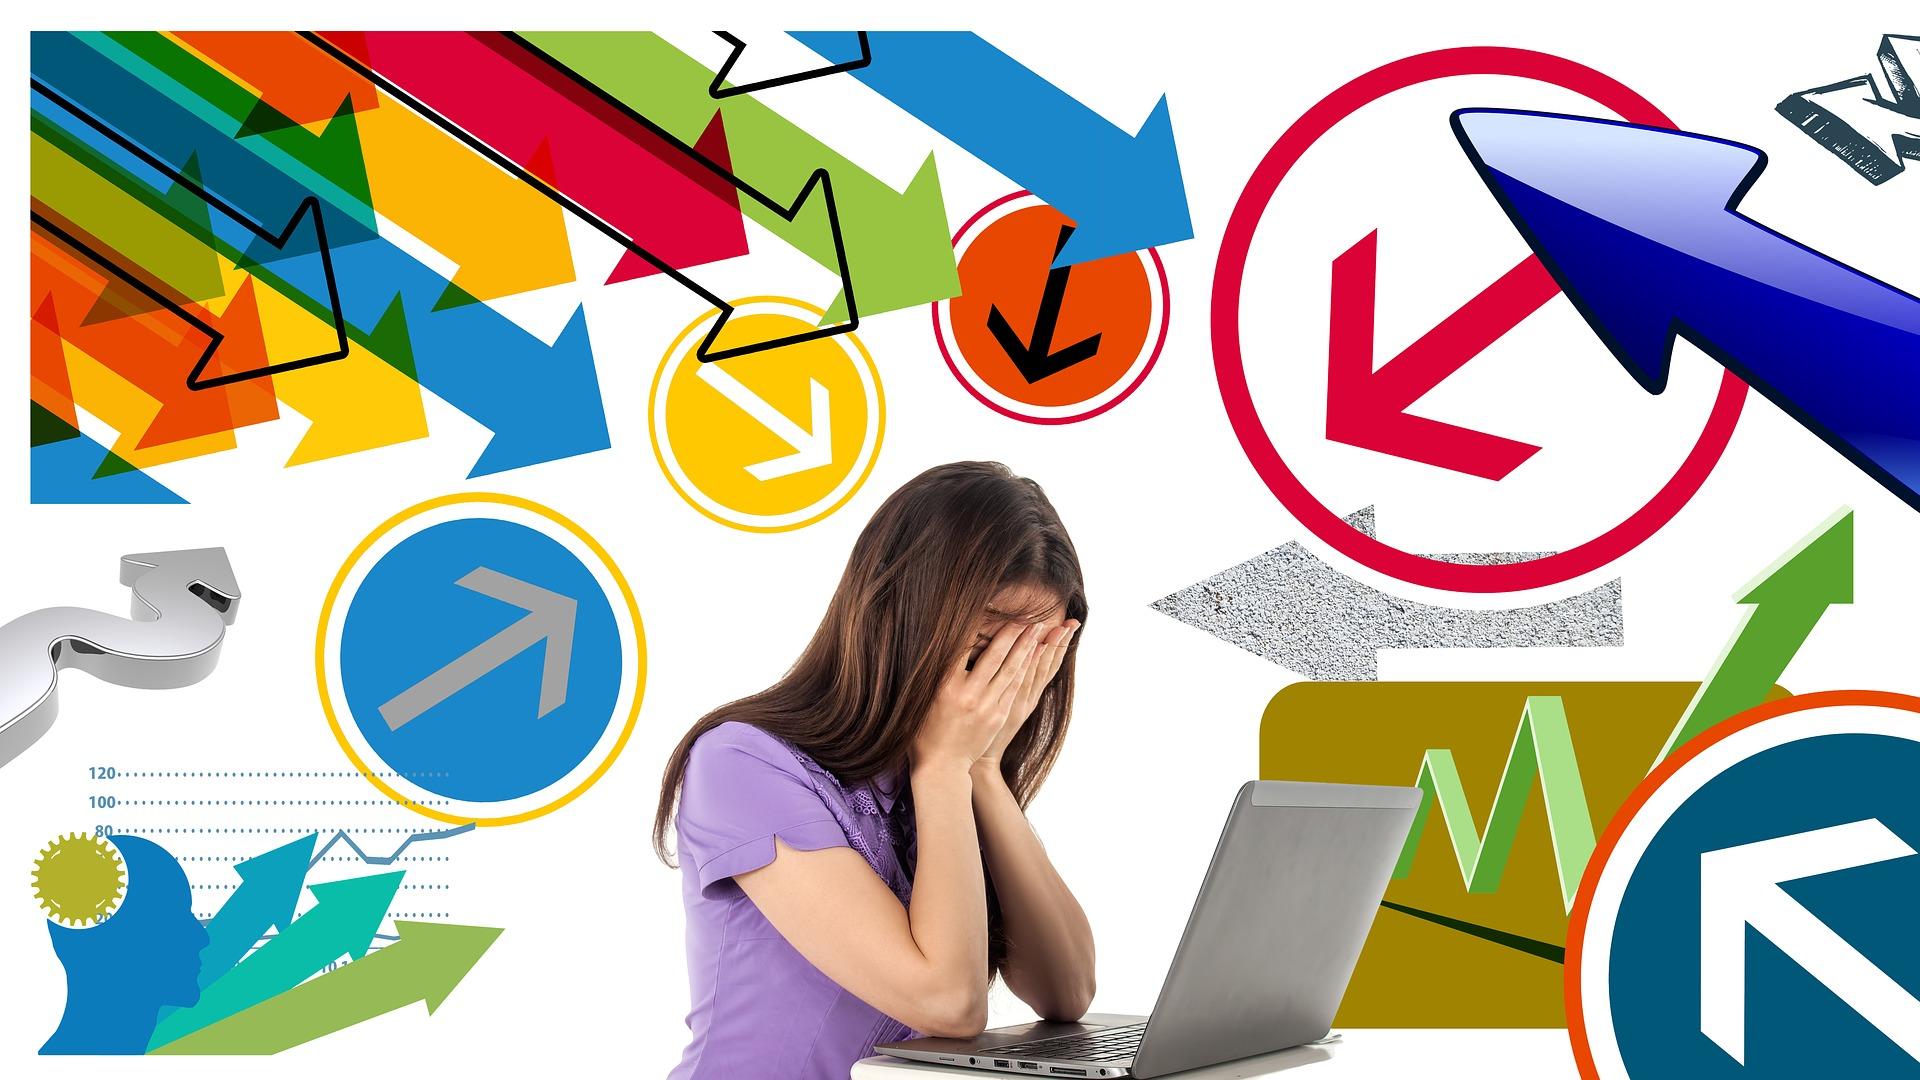 freelance writing overwhelm tips.jpg